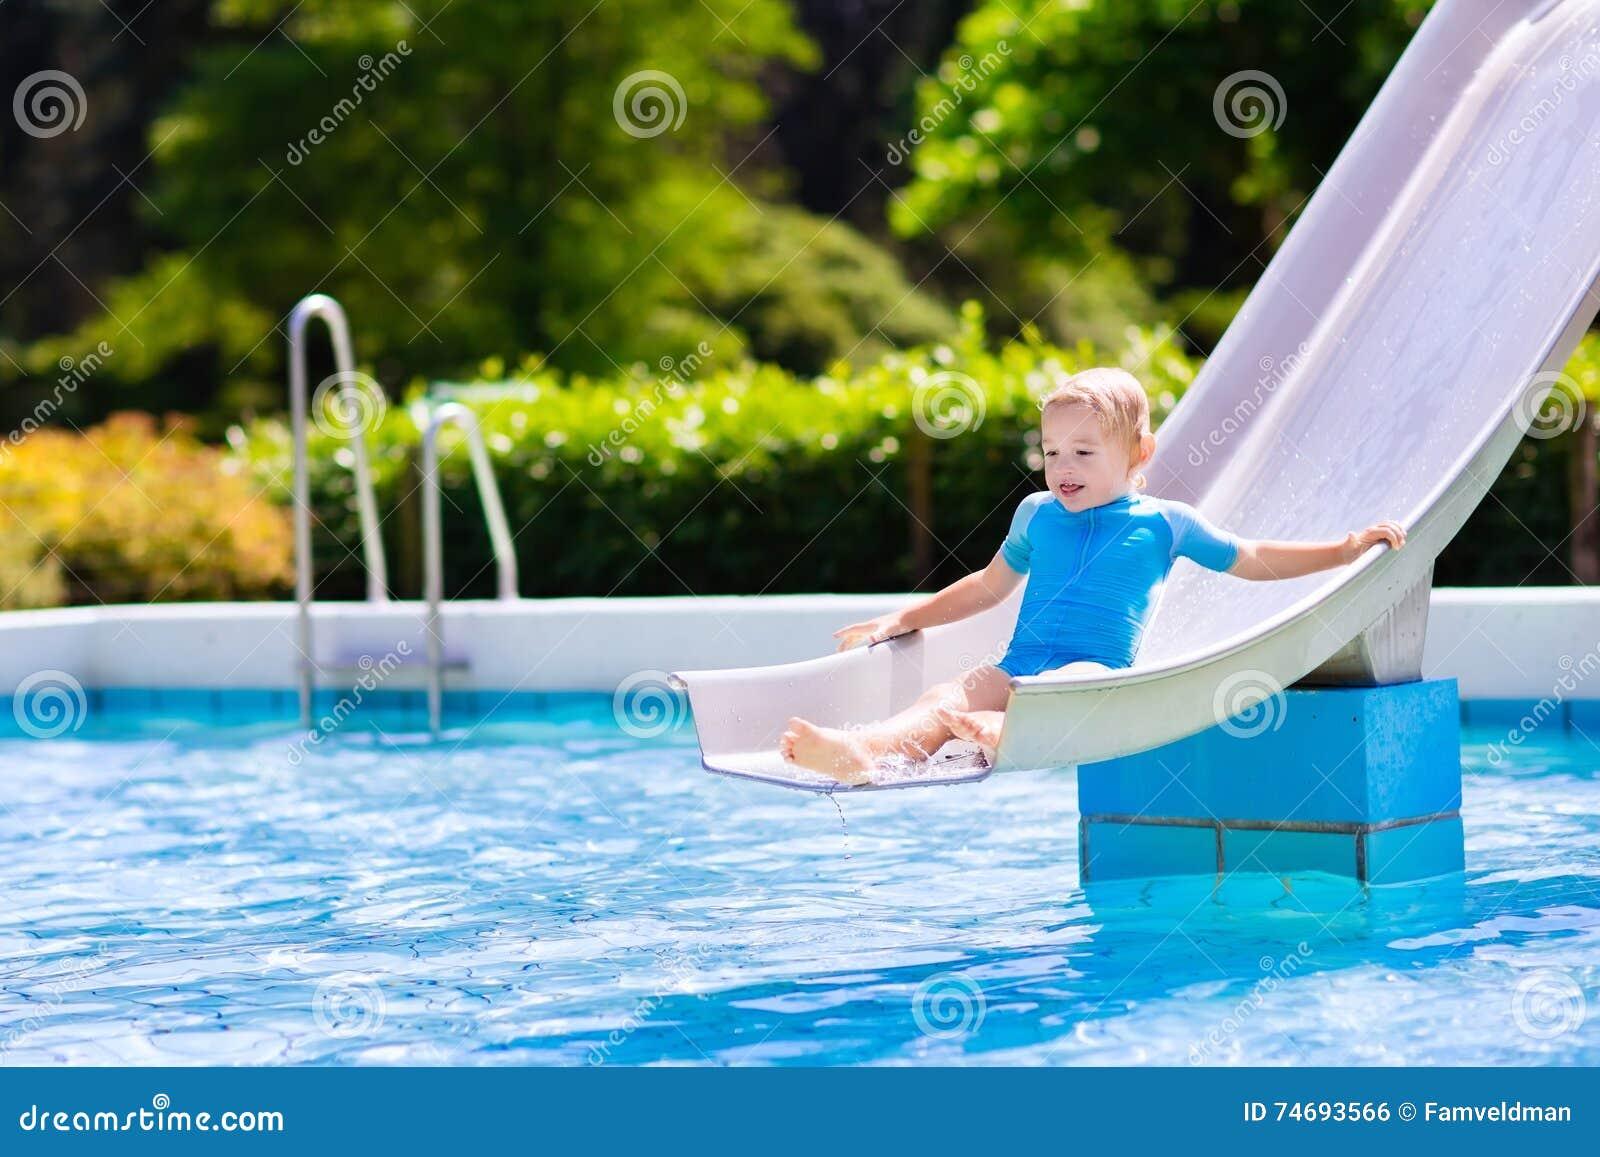 Kids On Water Slide In Swimming Pool Stock Photo 74693508